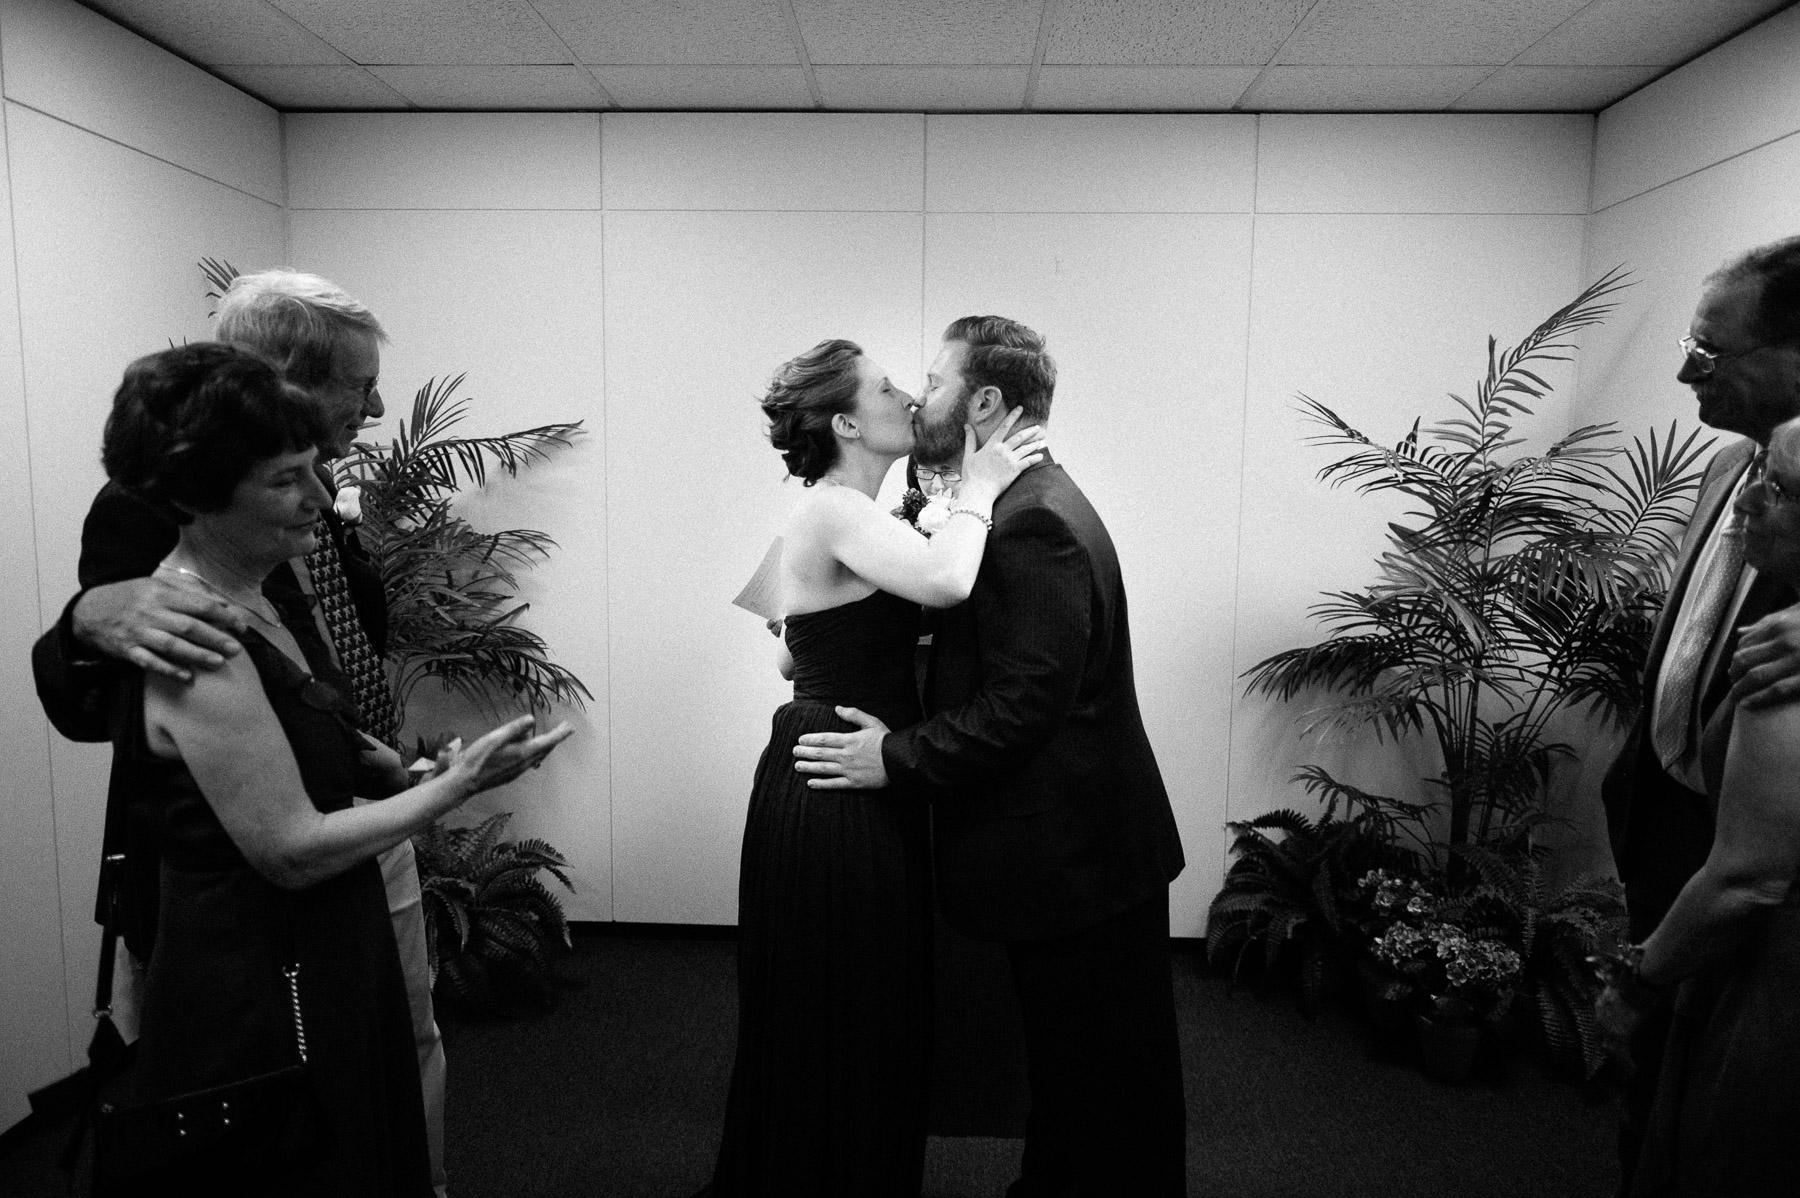 baltimore-courthouse-wedding-7.jpg